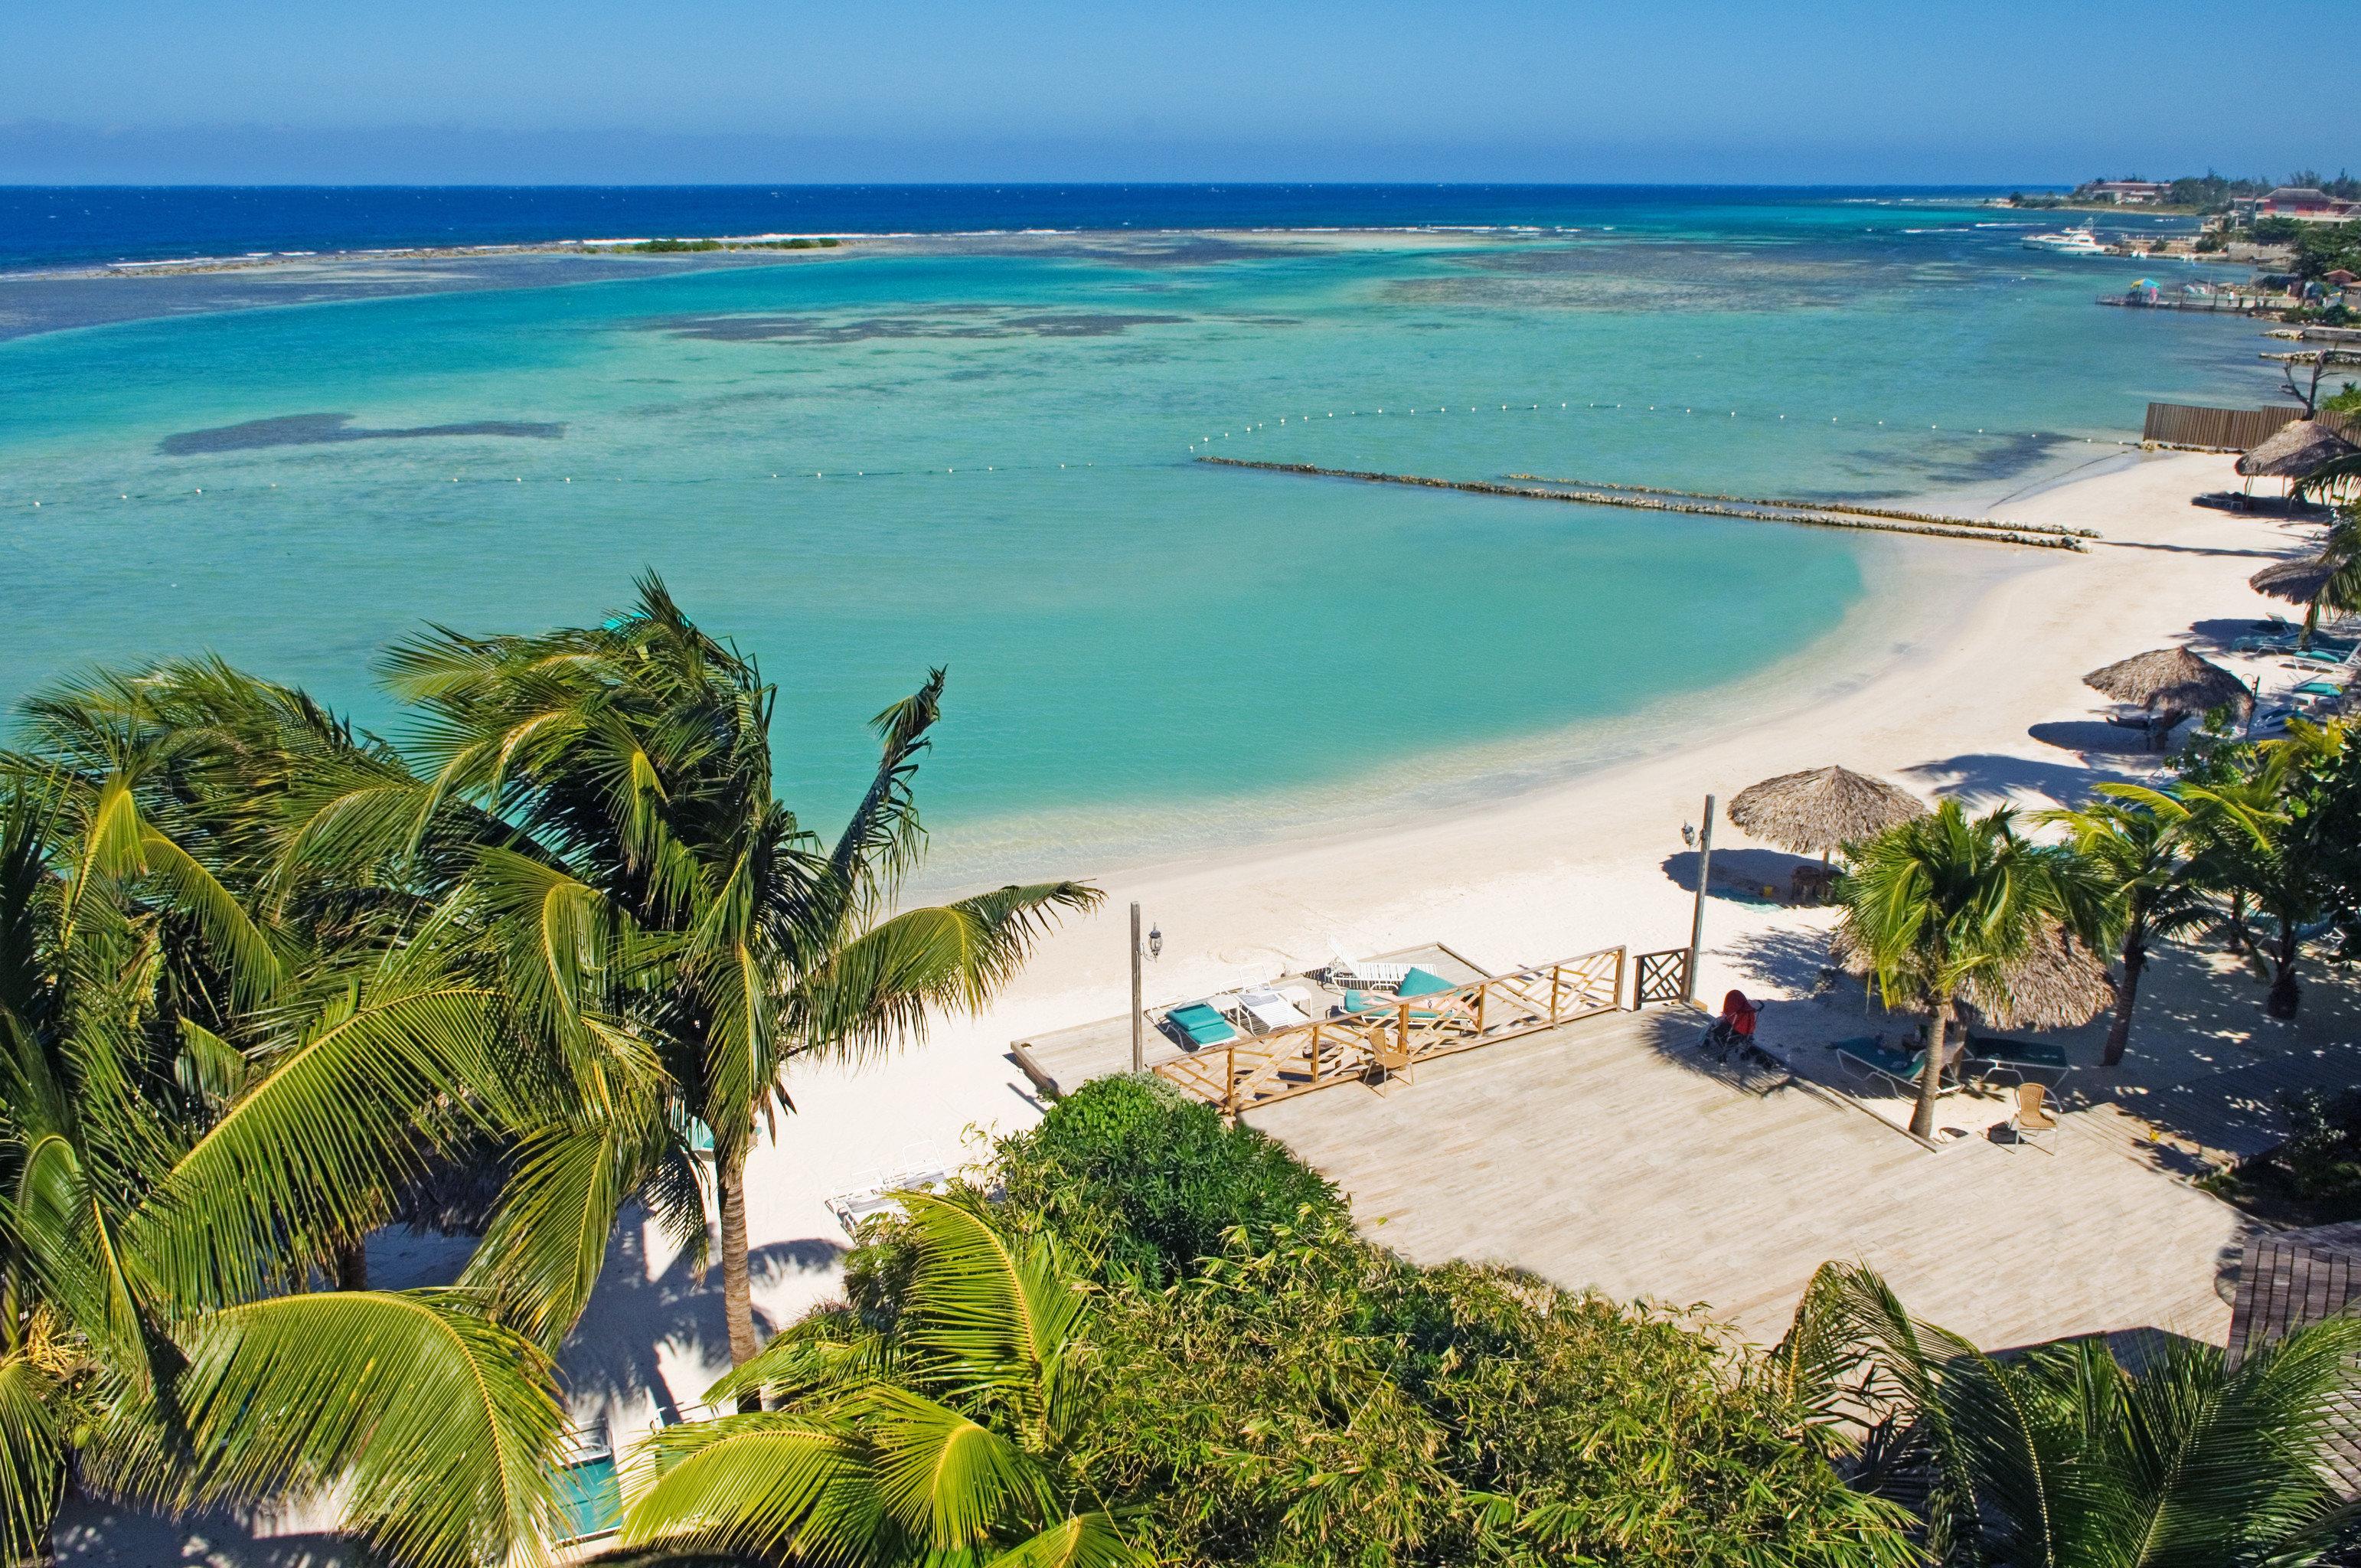 Beach Beachfront Grounds Island water sky Nature Sea Coast caribbean Ocean tropics Resort reef shore cape Lagoon arecales cove islet overlooking lined palm plant